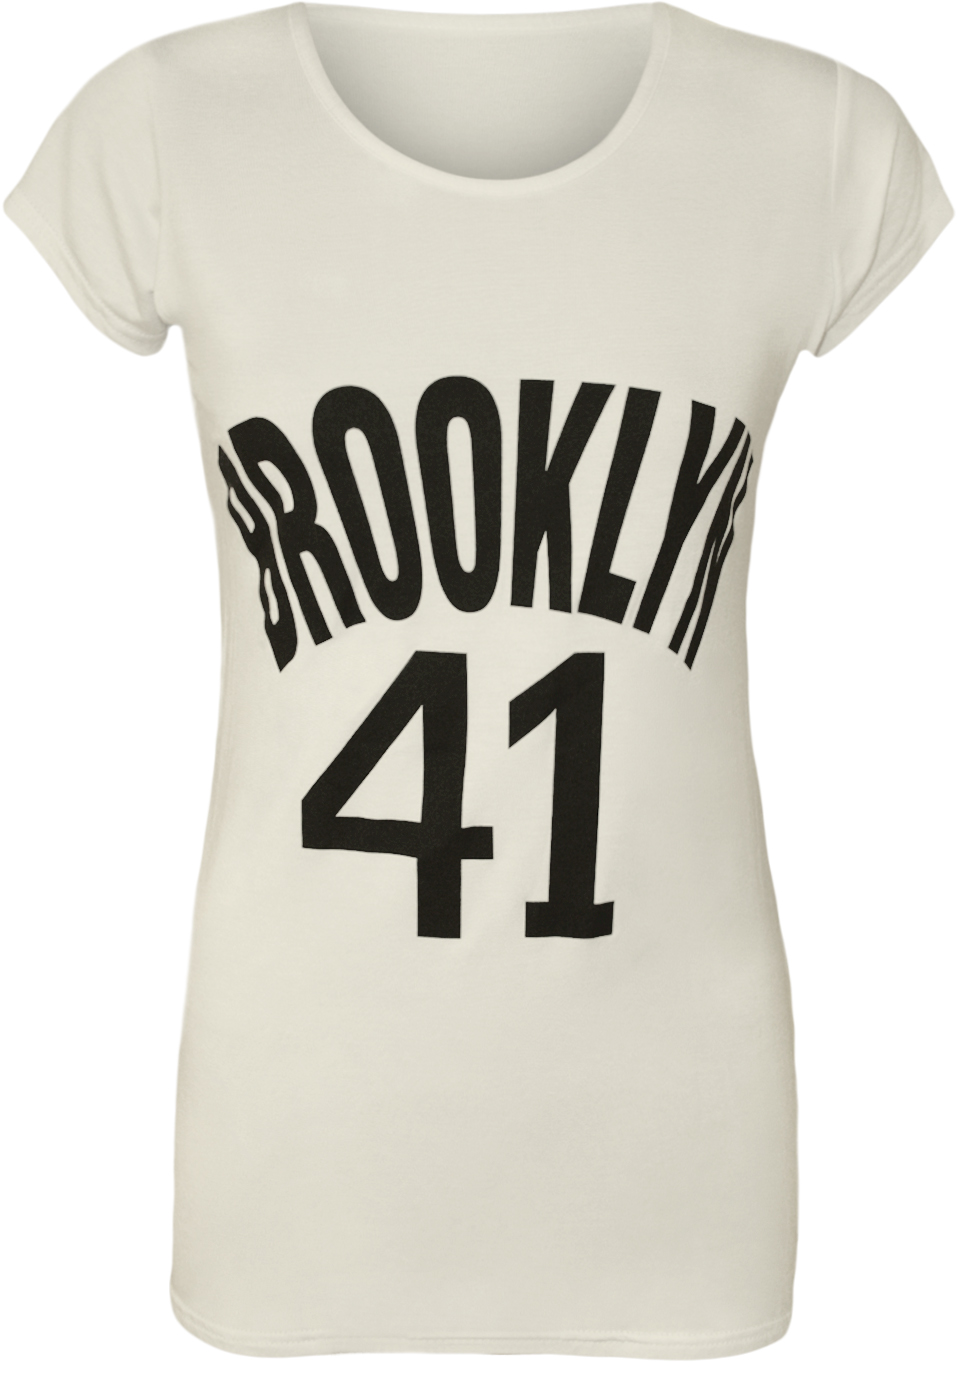 Laurene brooklyn print t shirt for T shirt printing brooklyn